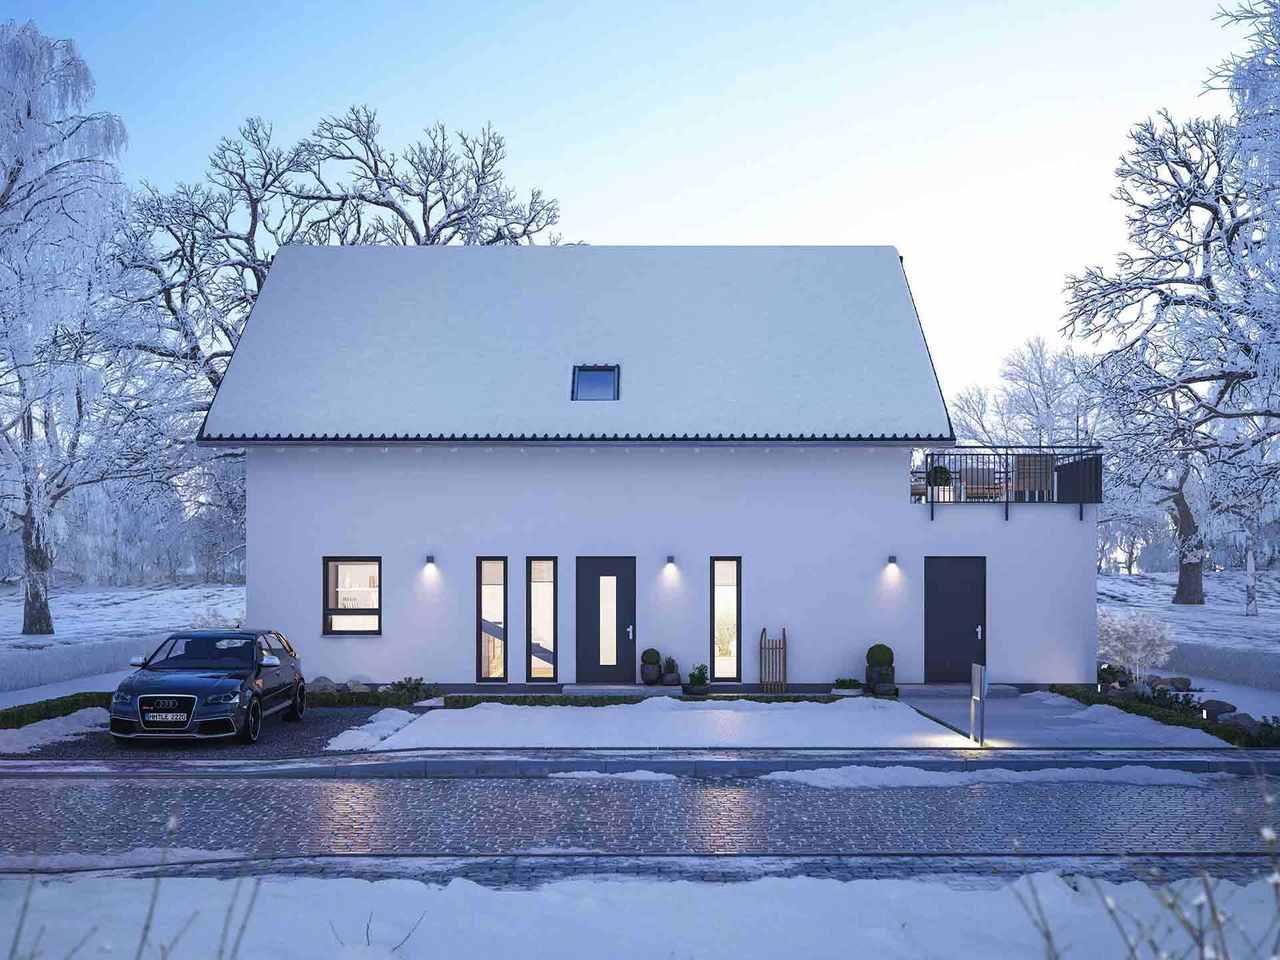 Einfamilienhaus LifeStyle 18.02 S - Winter